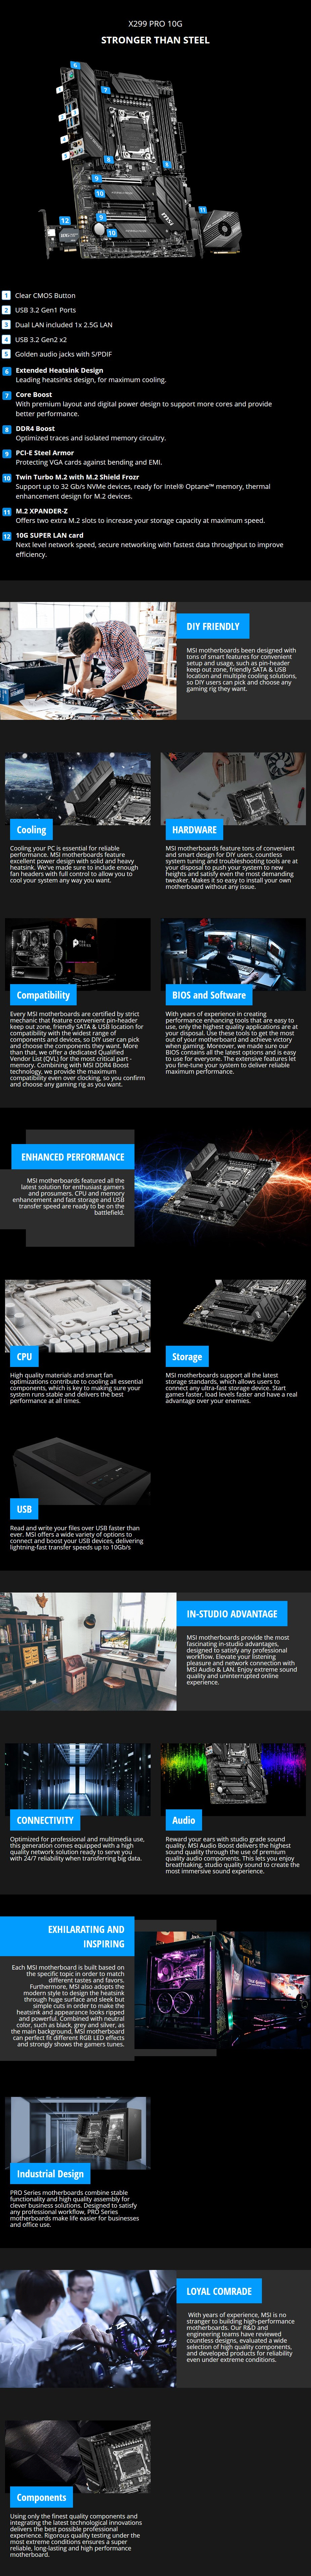 MSI X299 PRO 10G LGA 2066 ATX Motherboard - Overview 1